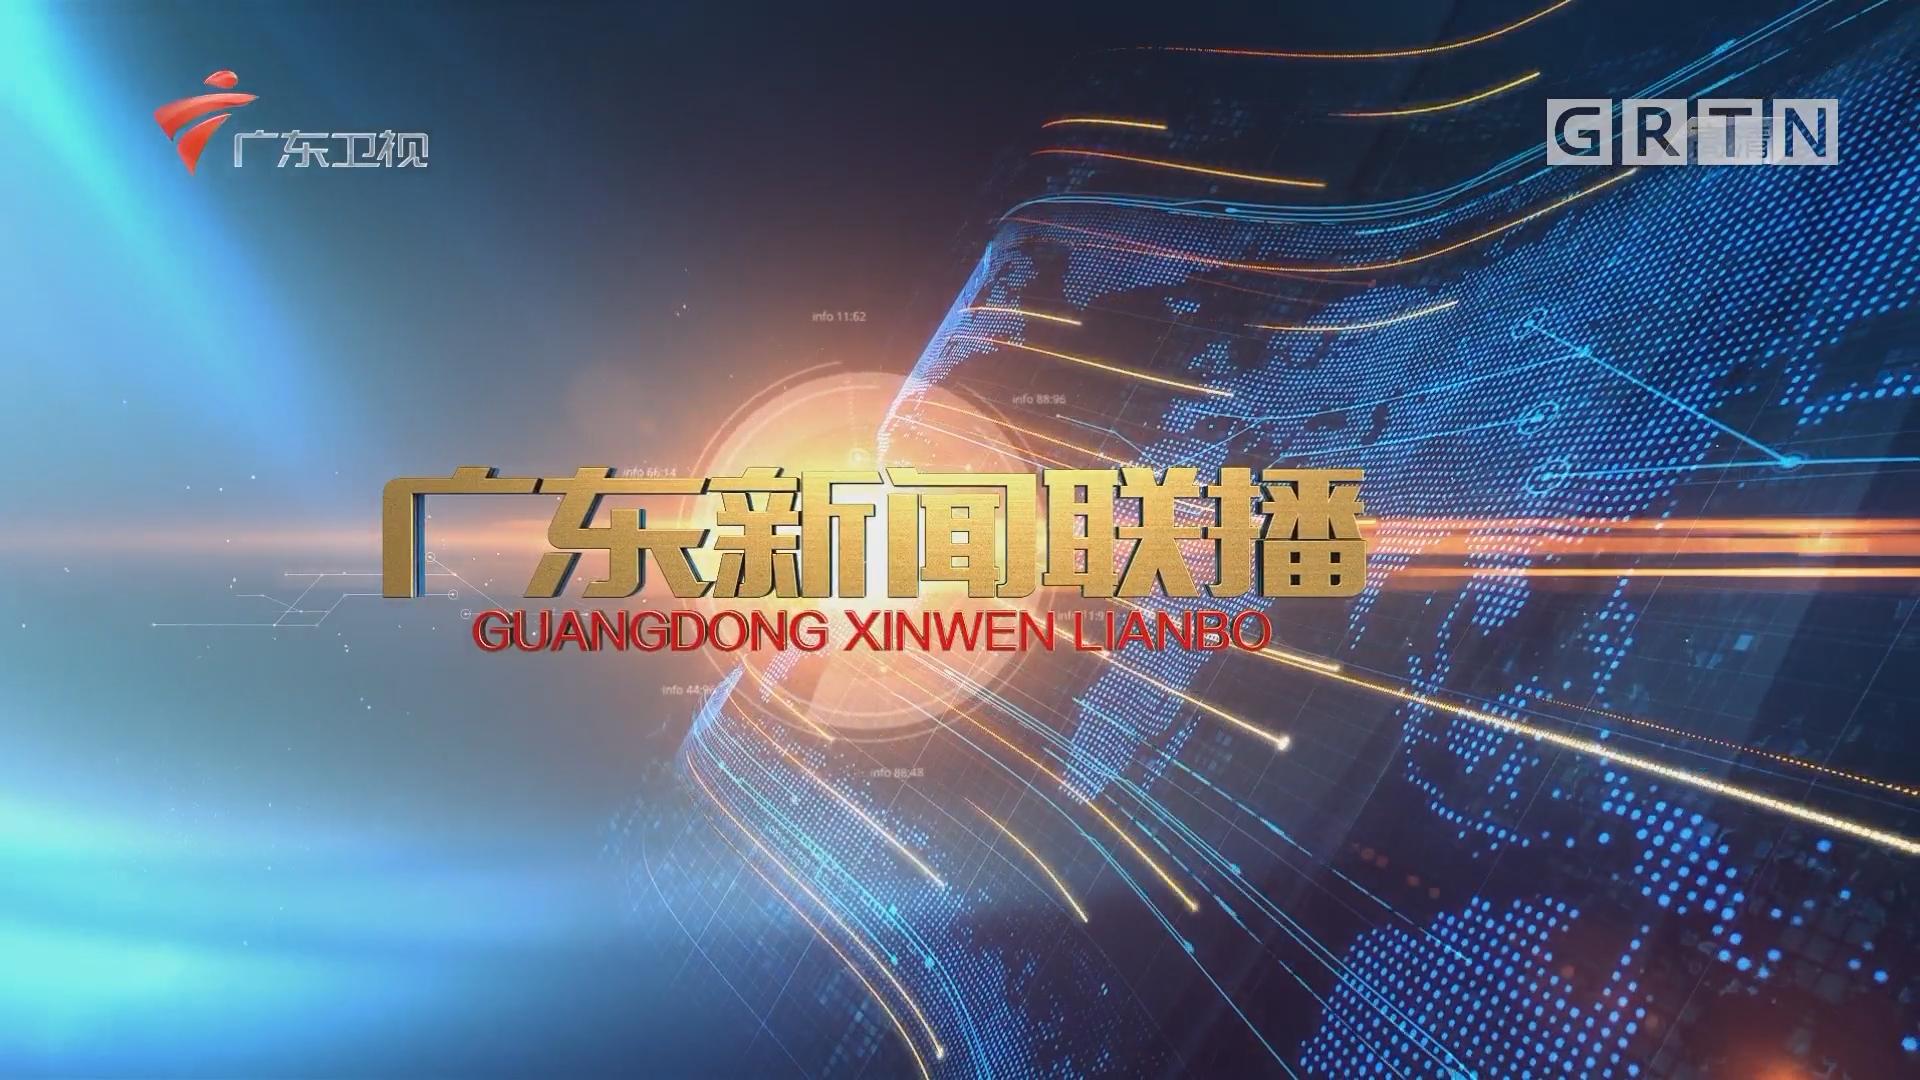 [HD][2019-02-02]广东新闻联播:省领导亲切看望慰问老同志